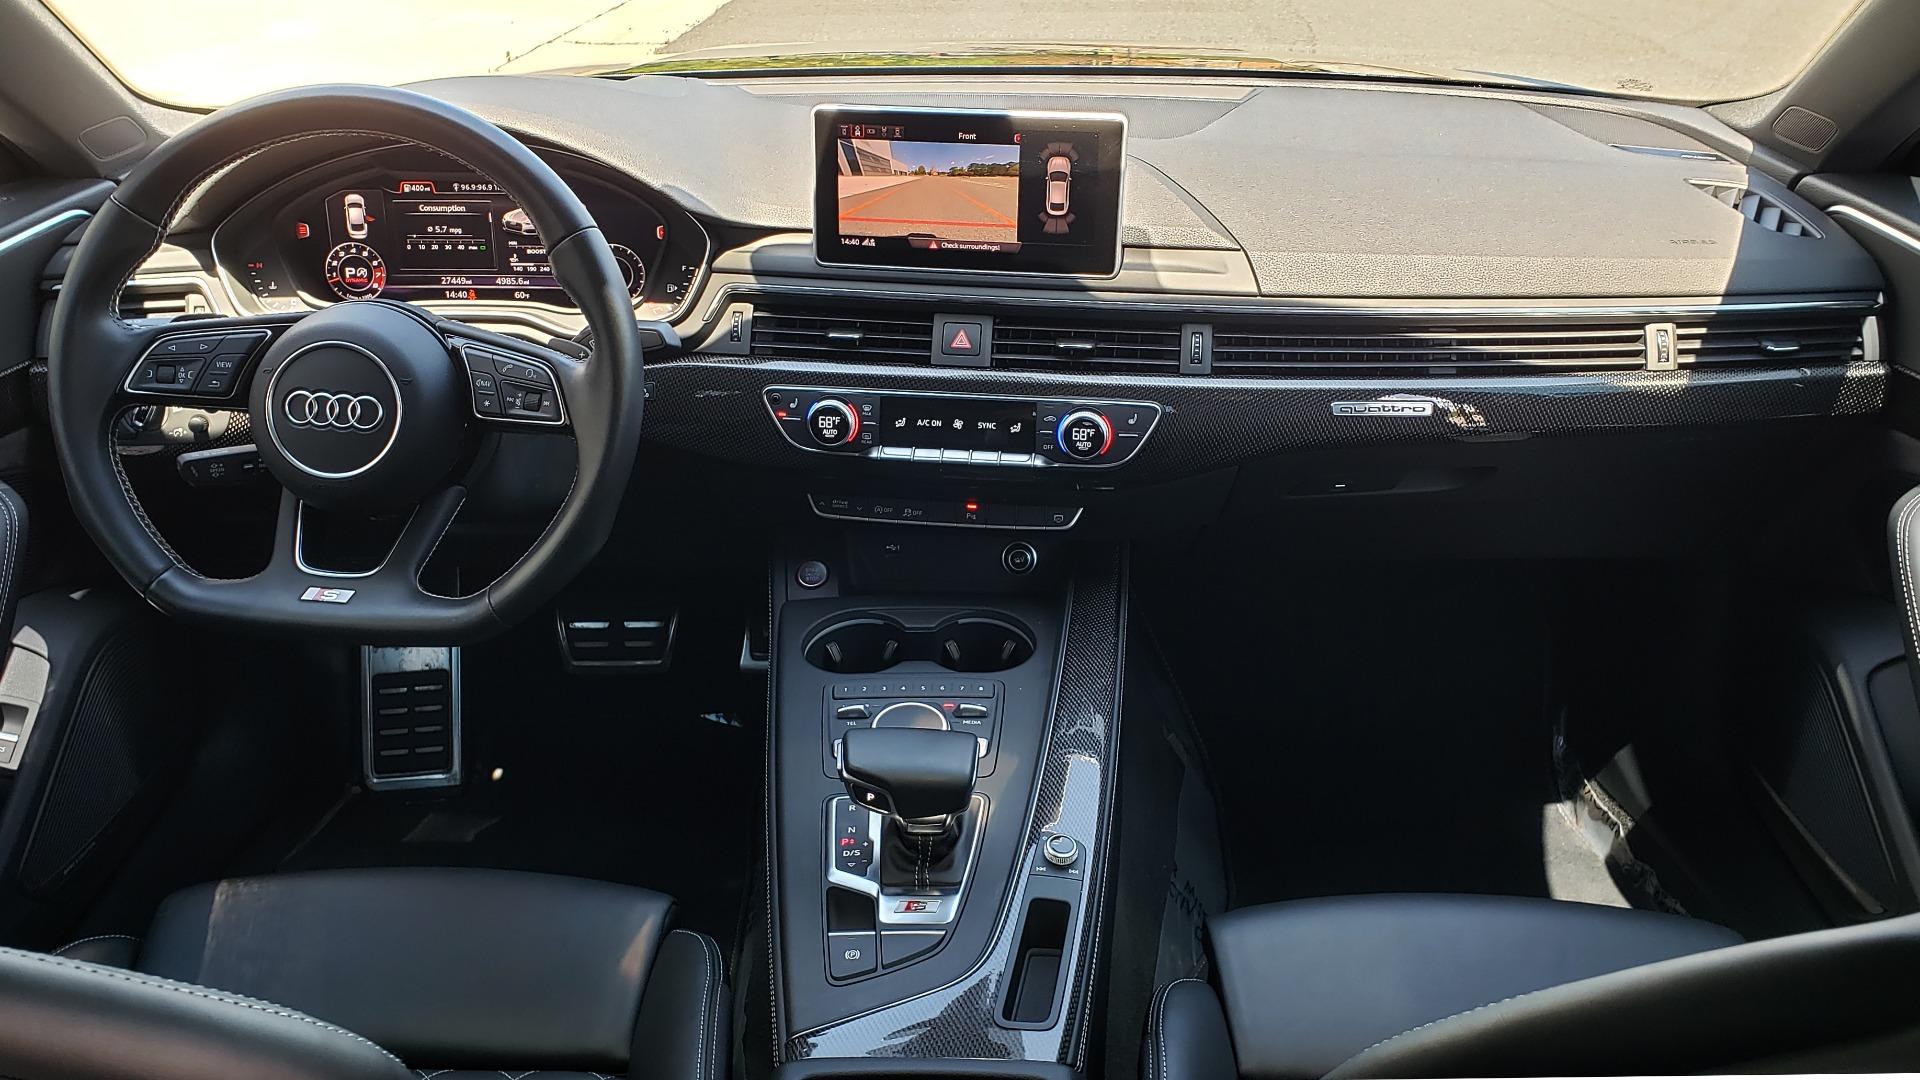 Used 2018 Audi S5 SPORTBACK PRESTIGE S-SPORT / NAV / SUNROOF / HUD / B&O SND / REARVIEW for sale $48,995 at Formula Imports in Charlotte NC 28227 67